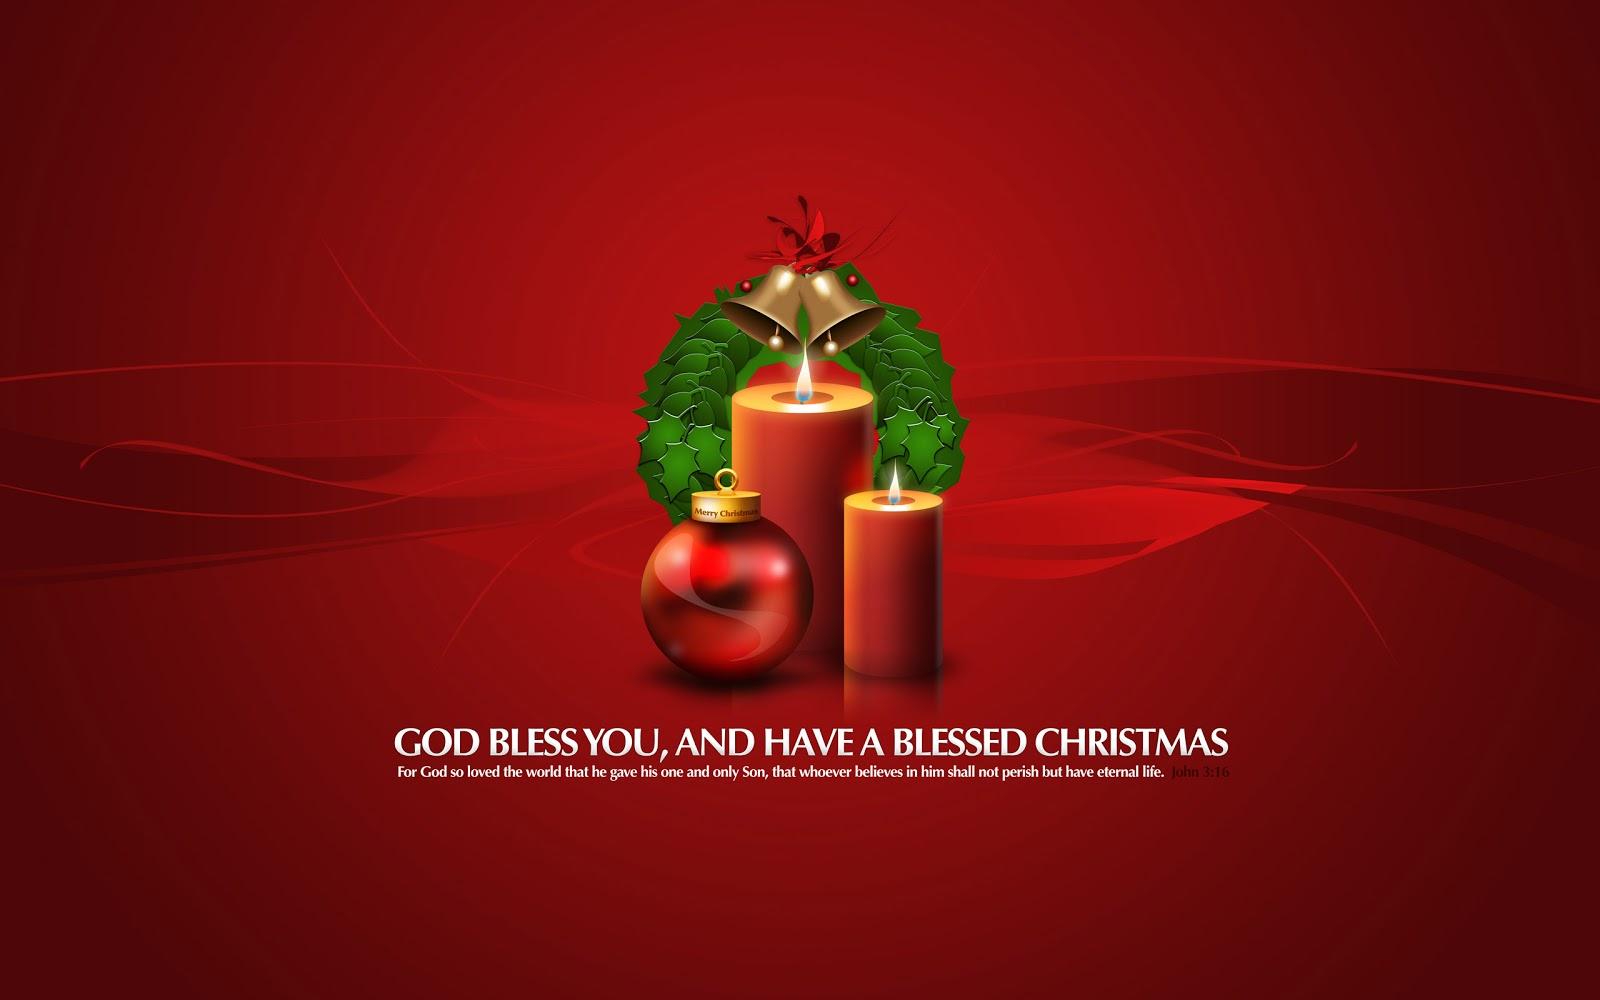 http://4.bp.blogspot.com/-DE4OFo_i-b0/ULcsvrz2ULI/AAAAAAAACpk/hD-XfeP0Iik/s1600/Christmas+wallpaper+2560x1600+007.jpg